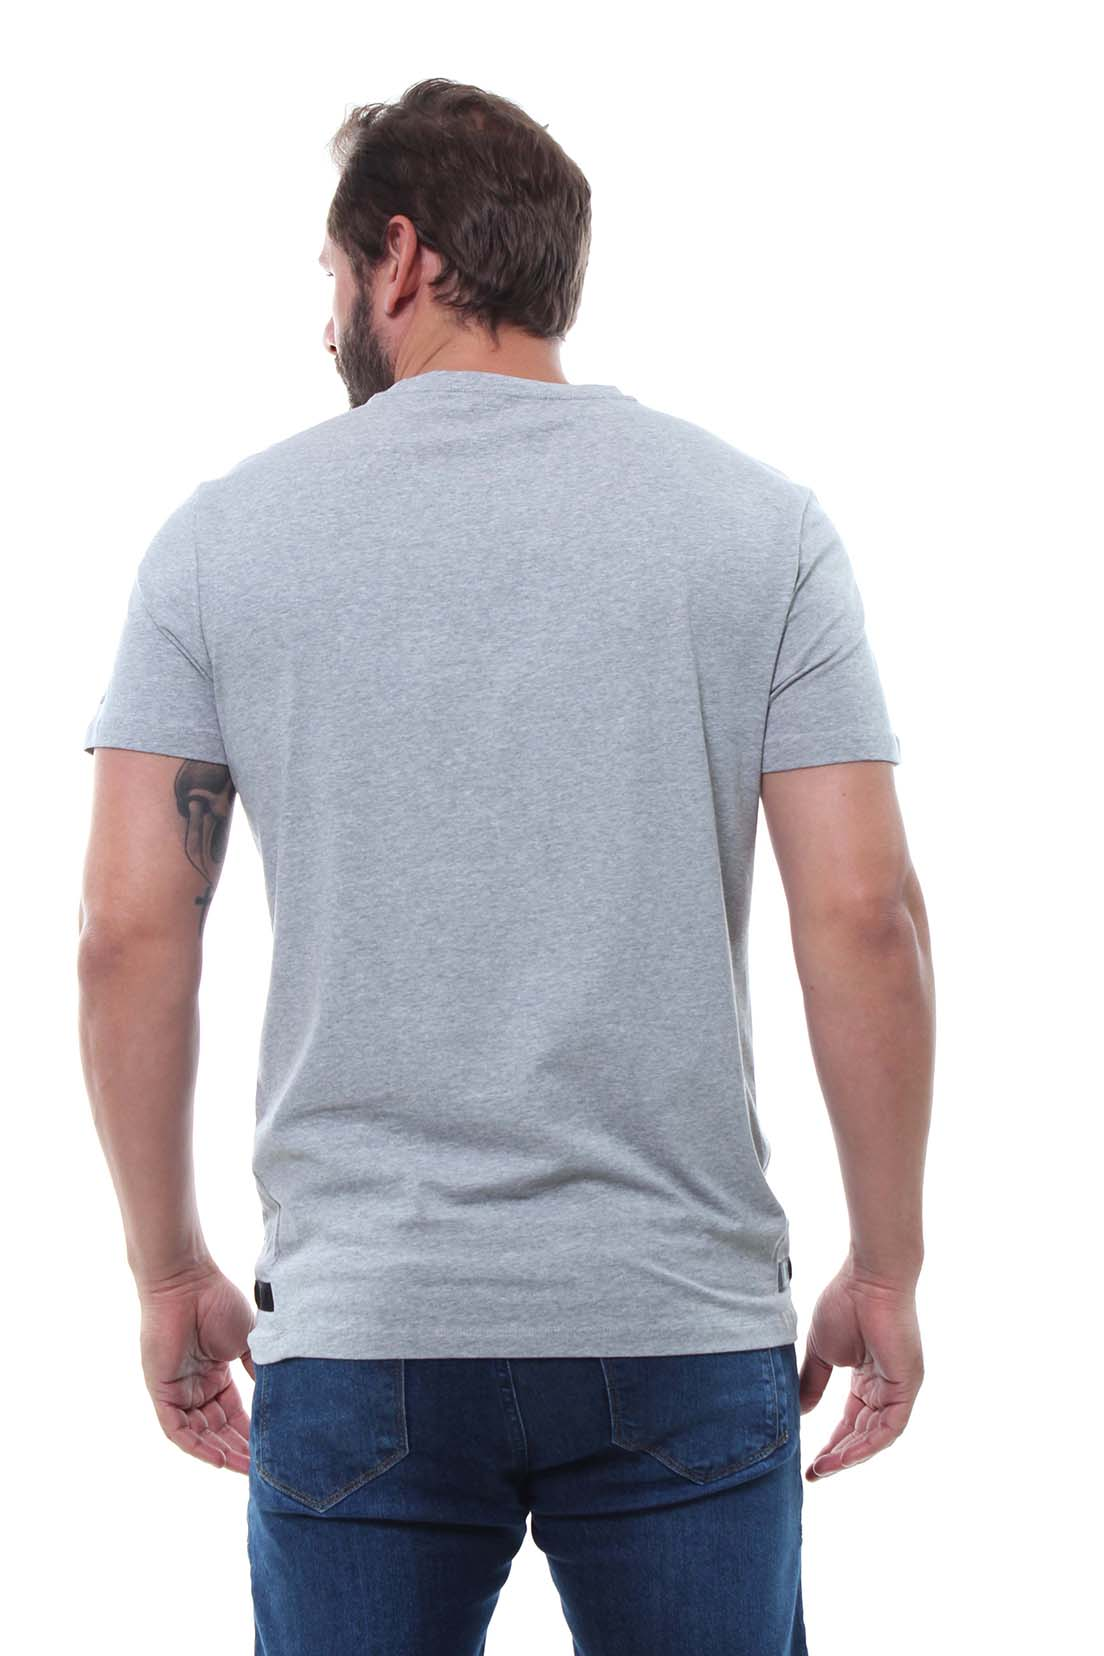 Camiseta Masculina Manga Curta Crocker - 47848  - CROCKER JEANS